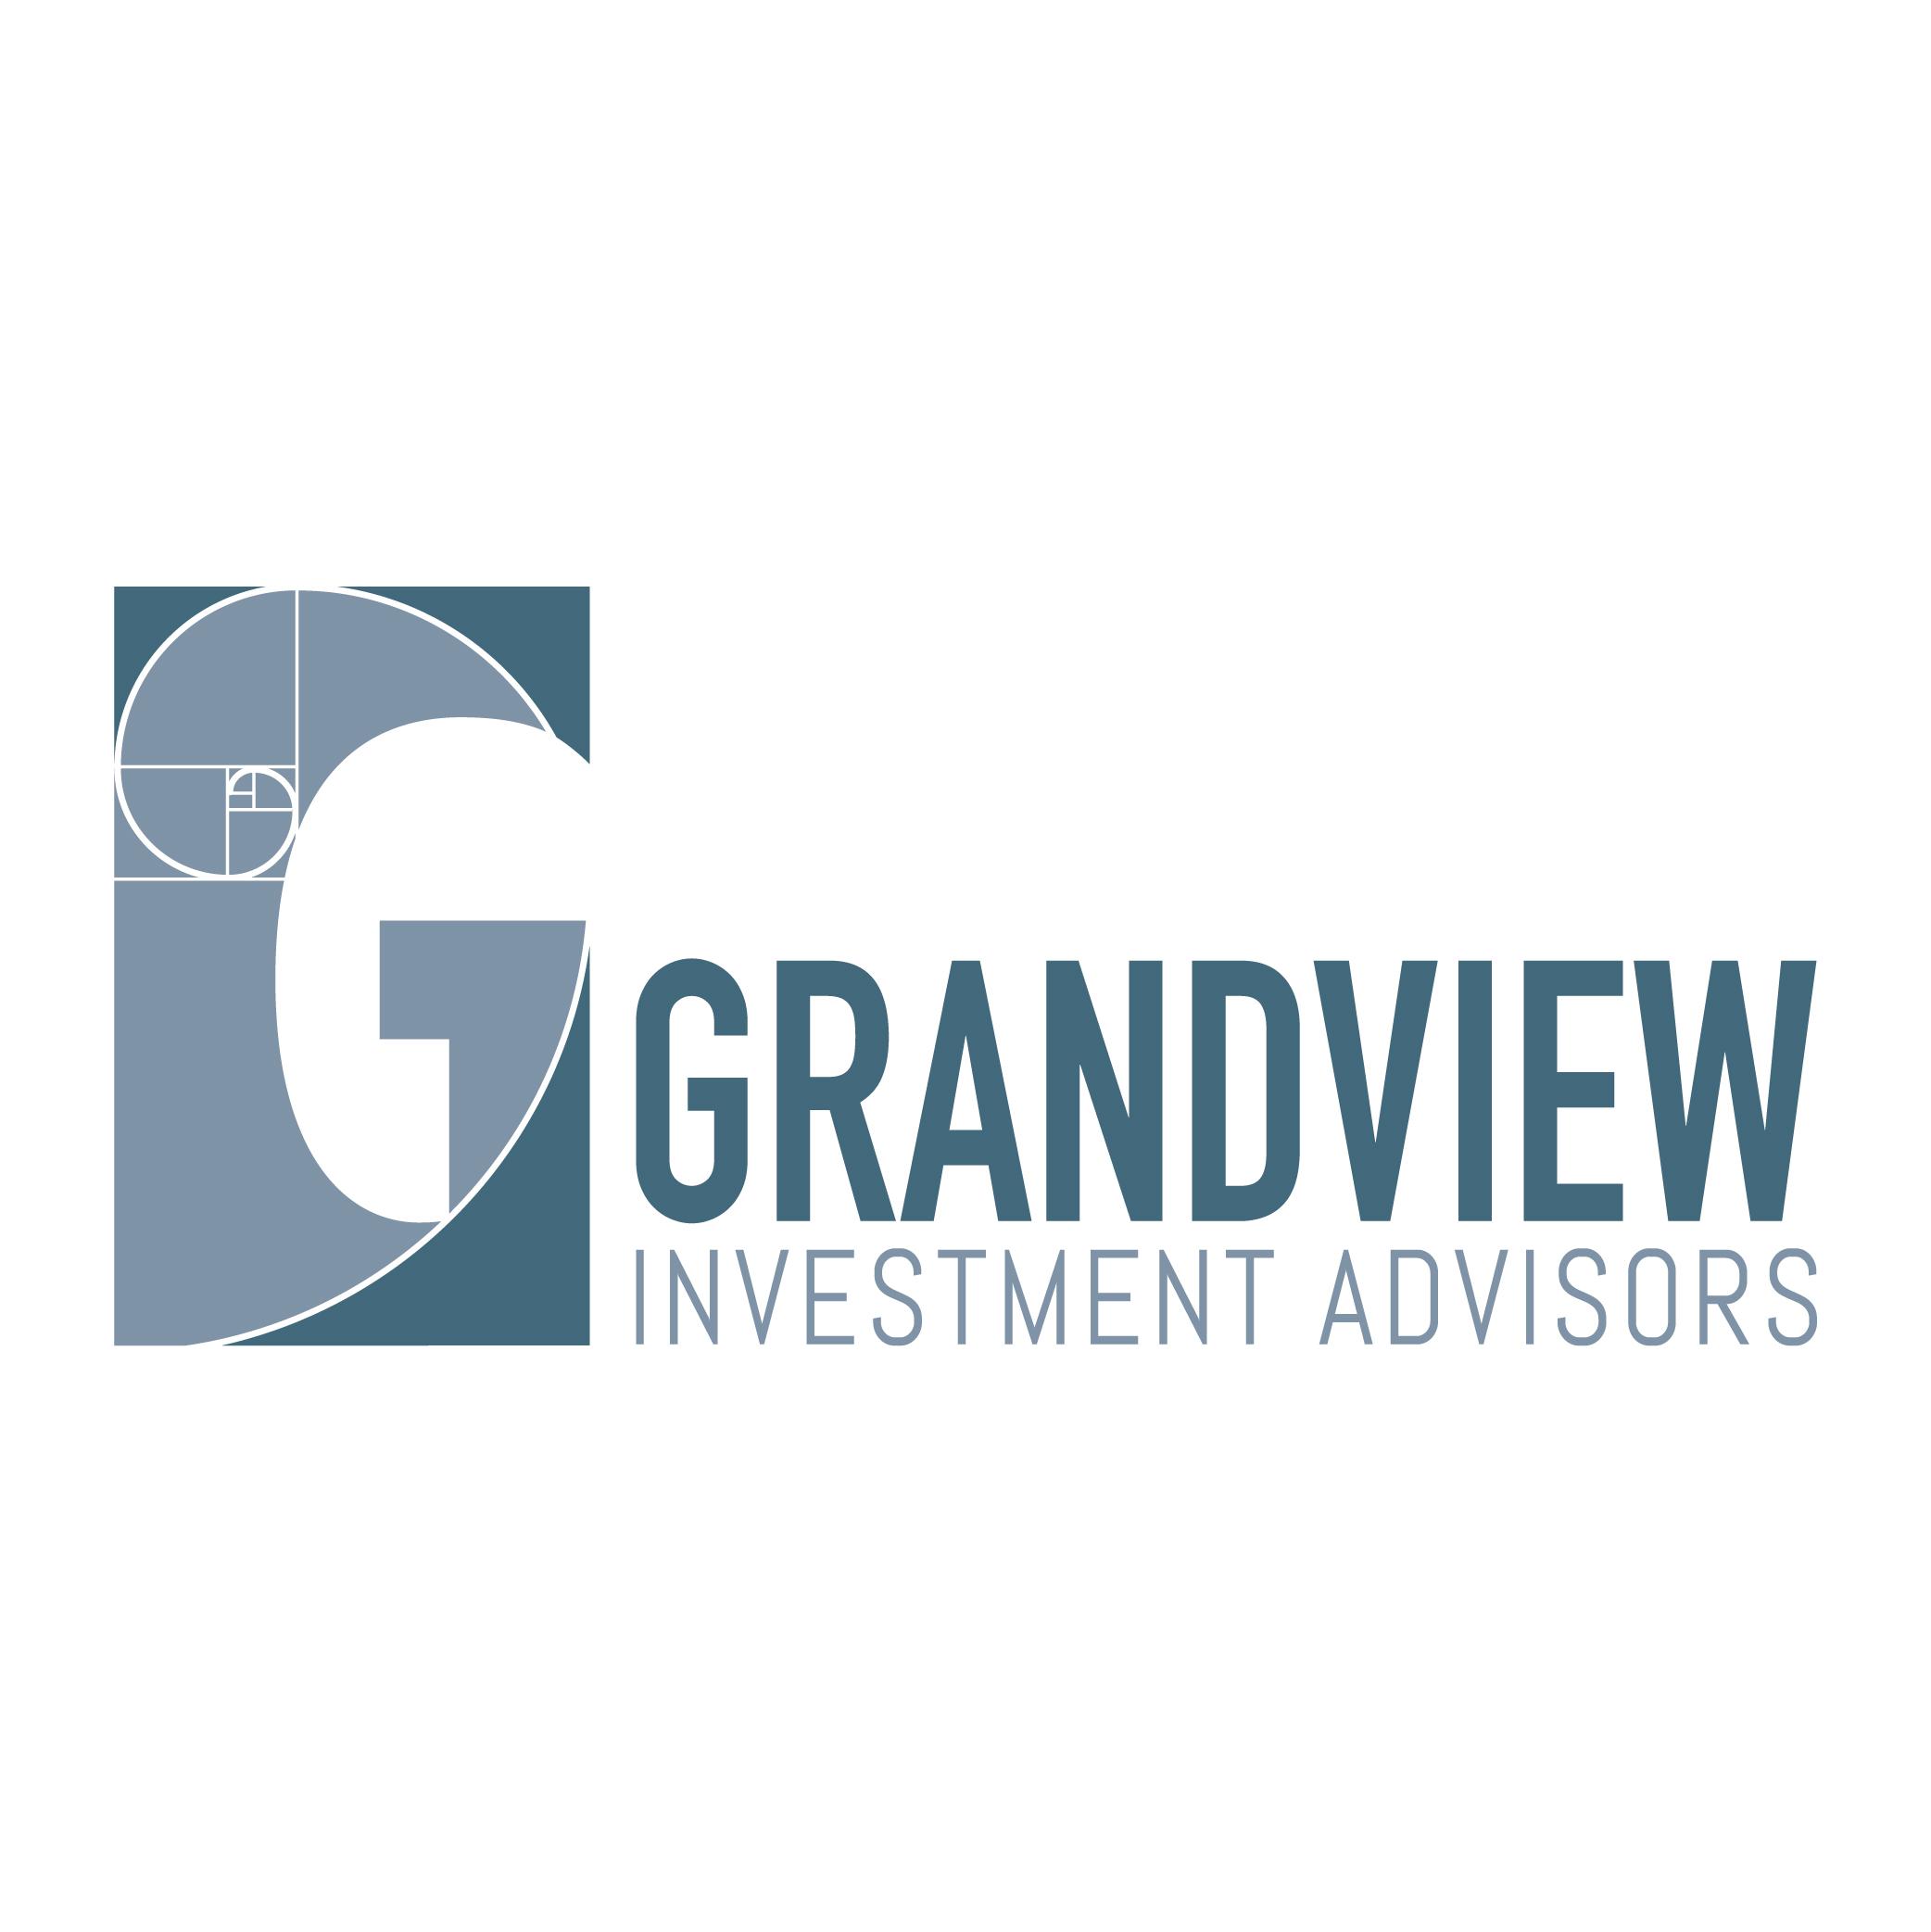 Grandview Investment